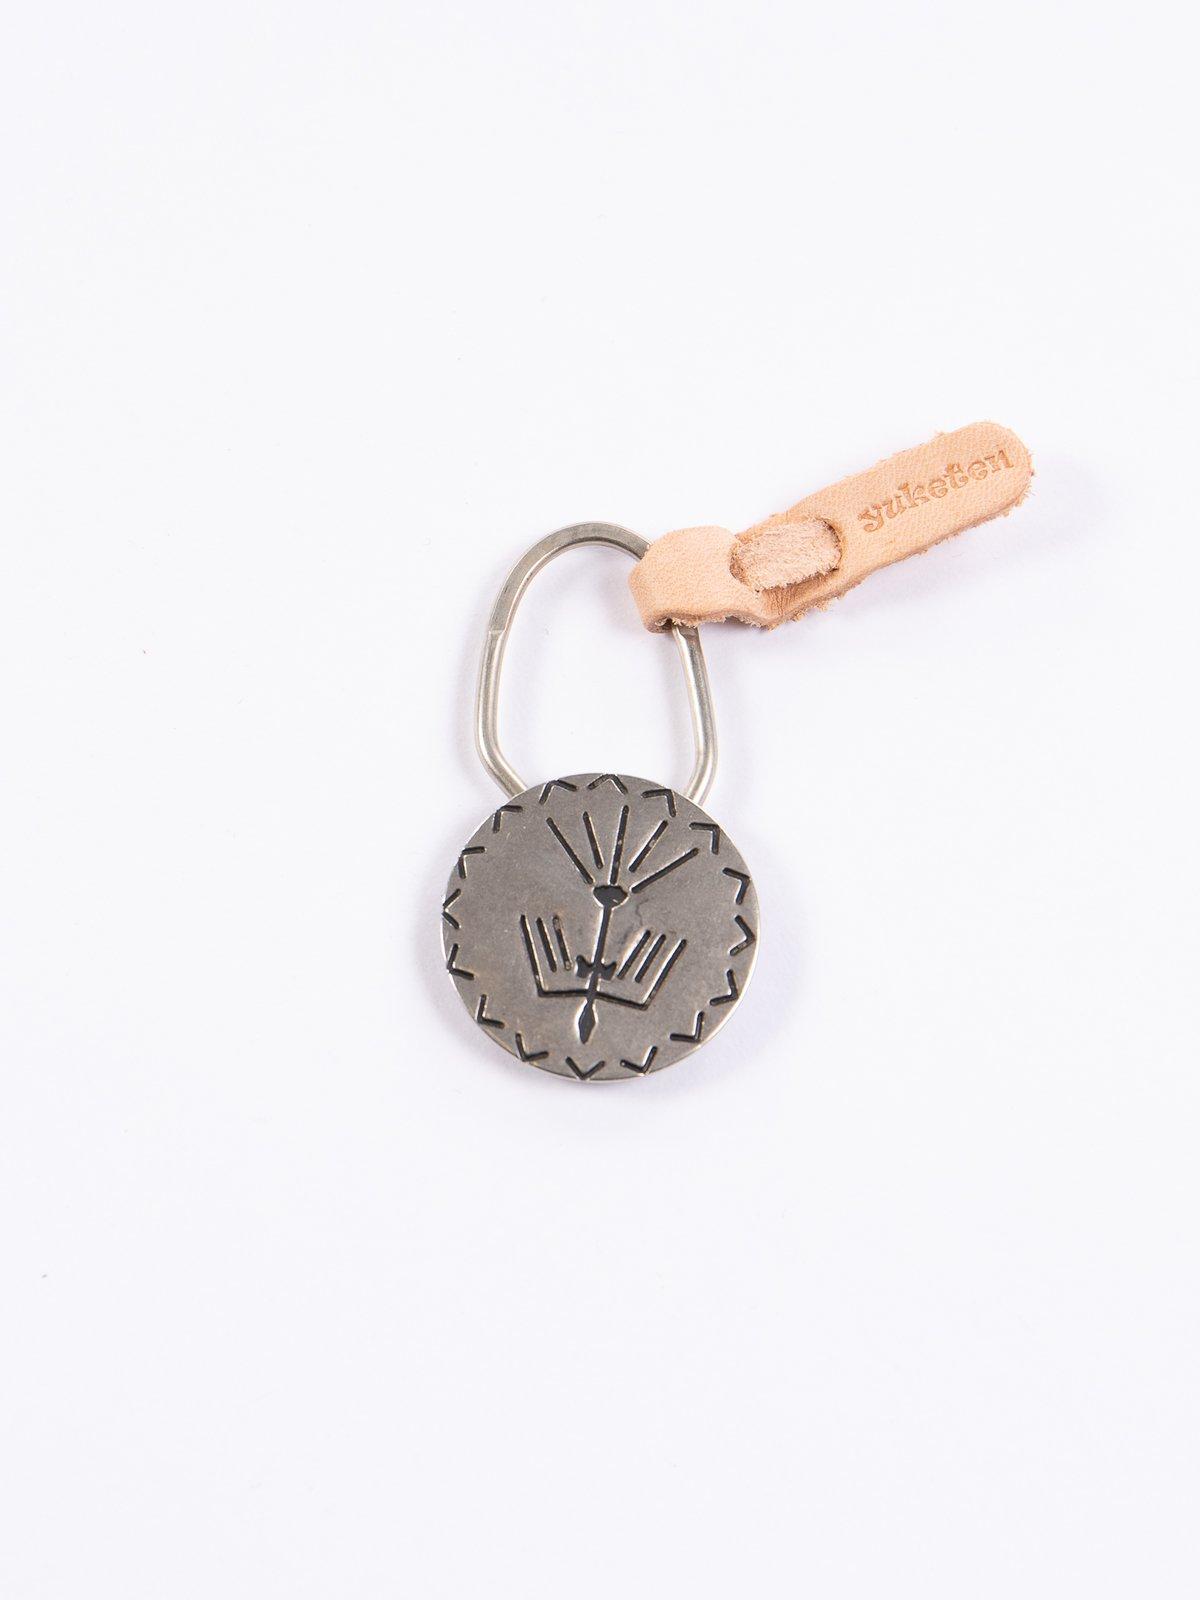 Nickel Silver Bird Concho Keychain - Image 1